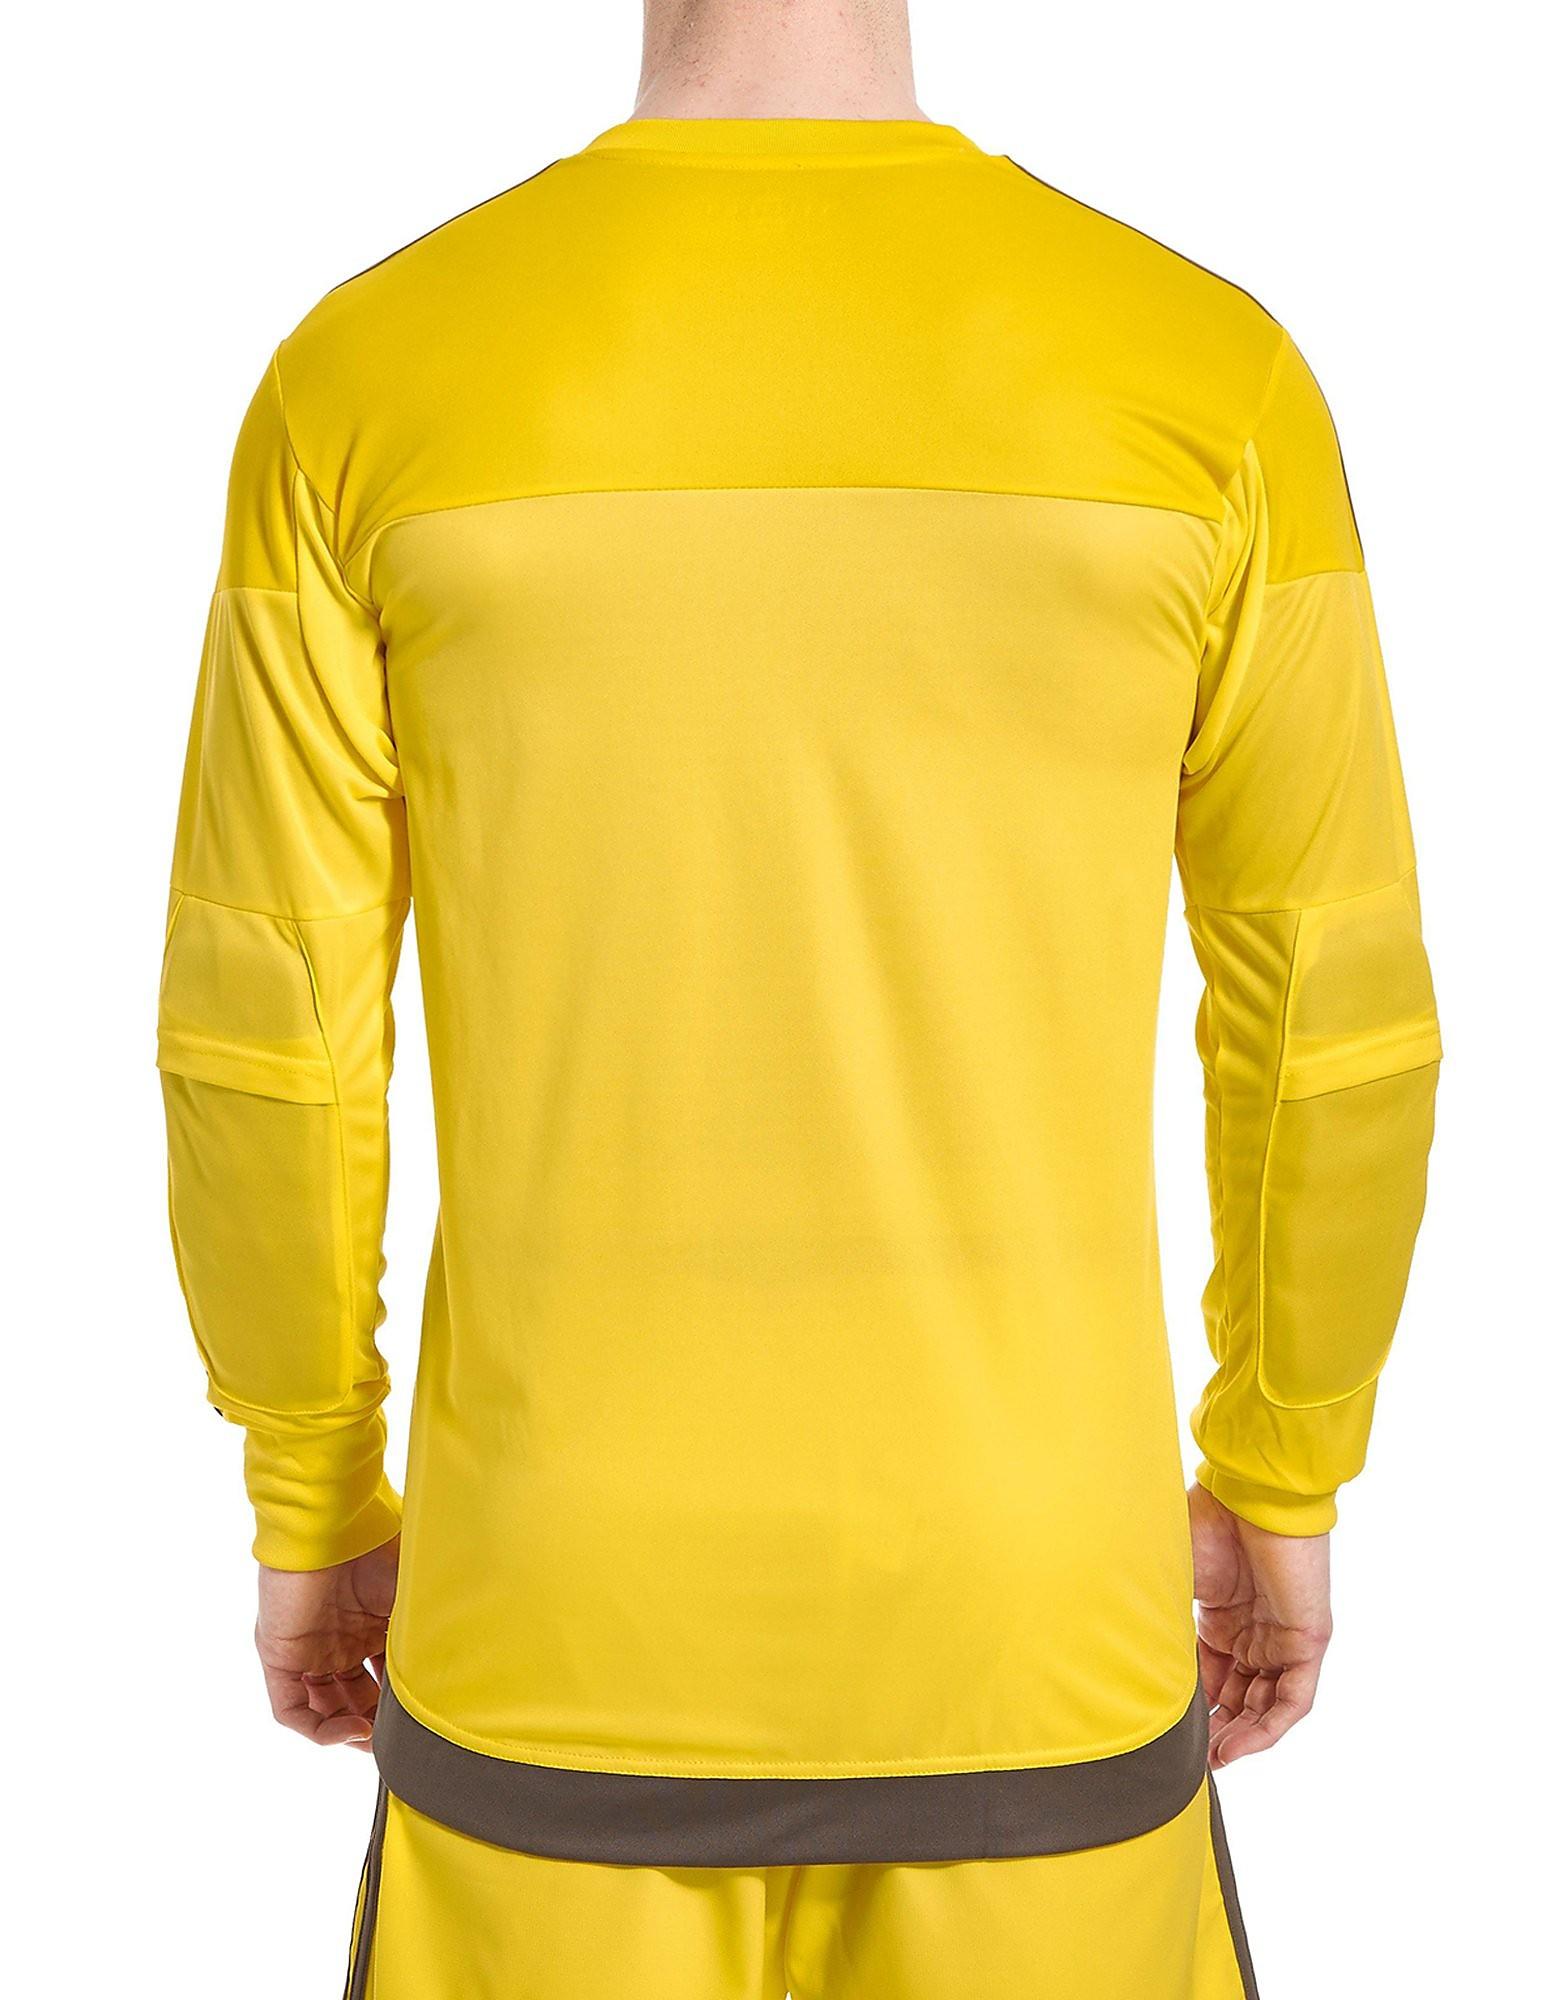 adidas Northern Ireland 2016 Home GK Shirt